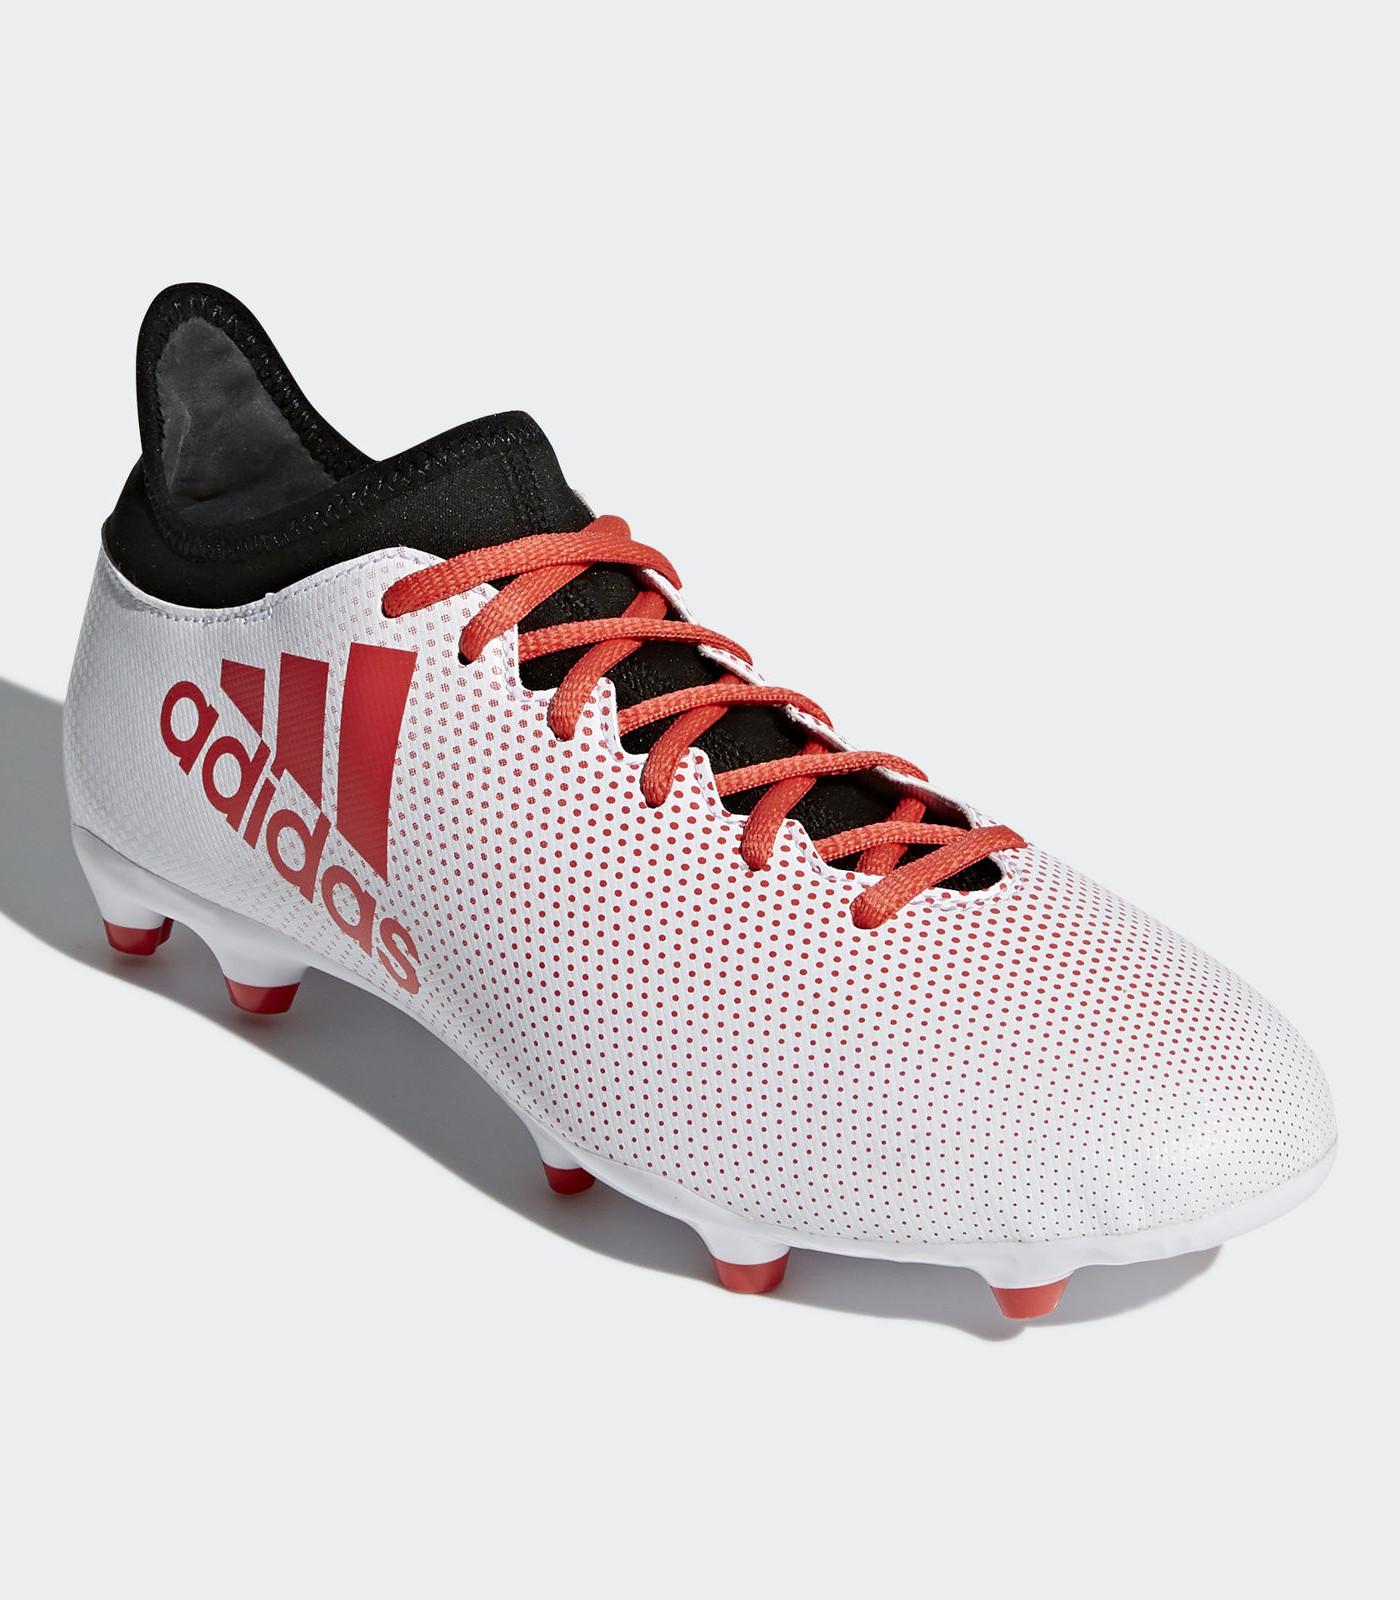 adidas scarpe con calzino